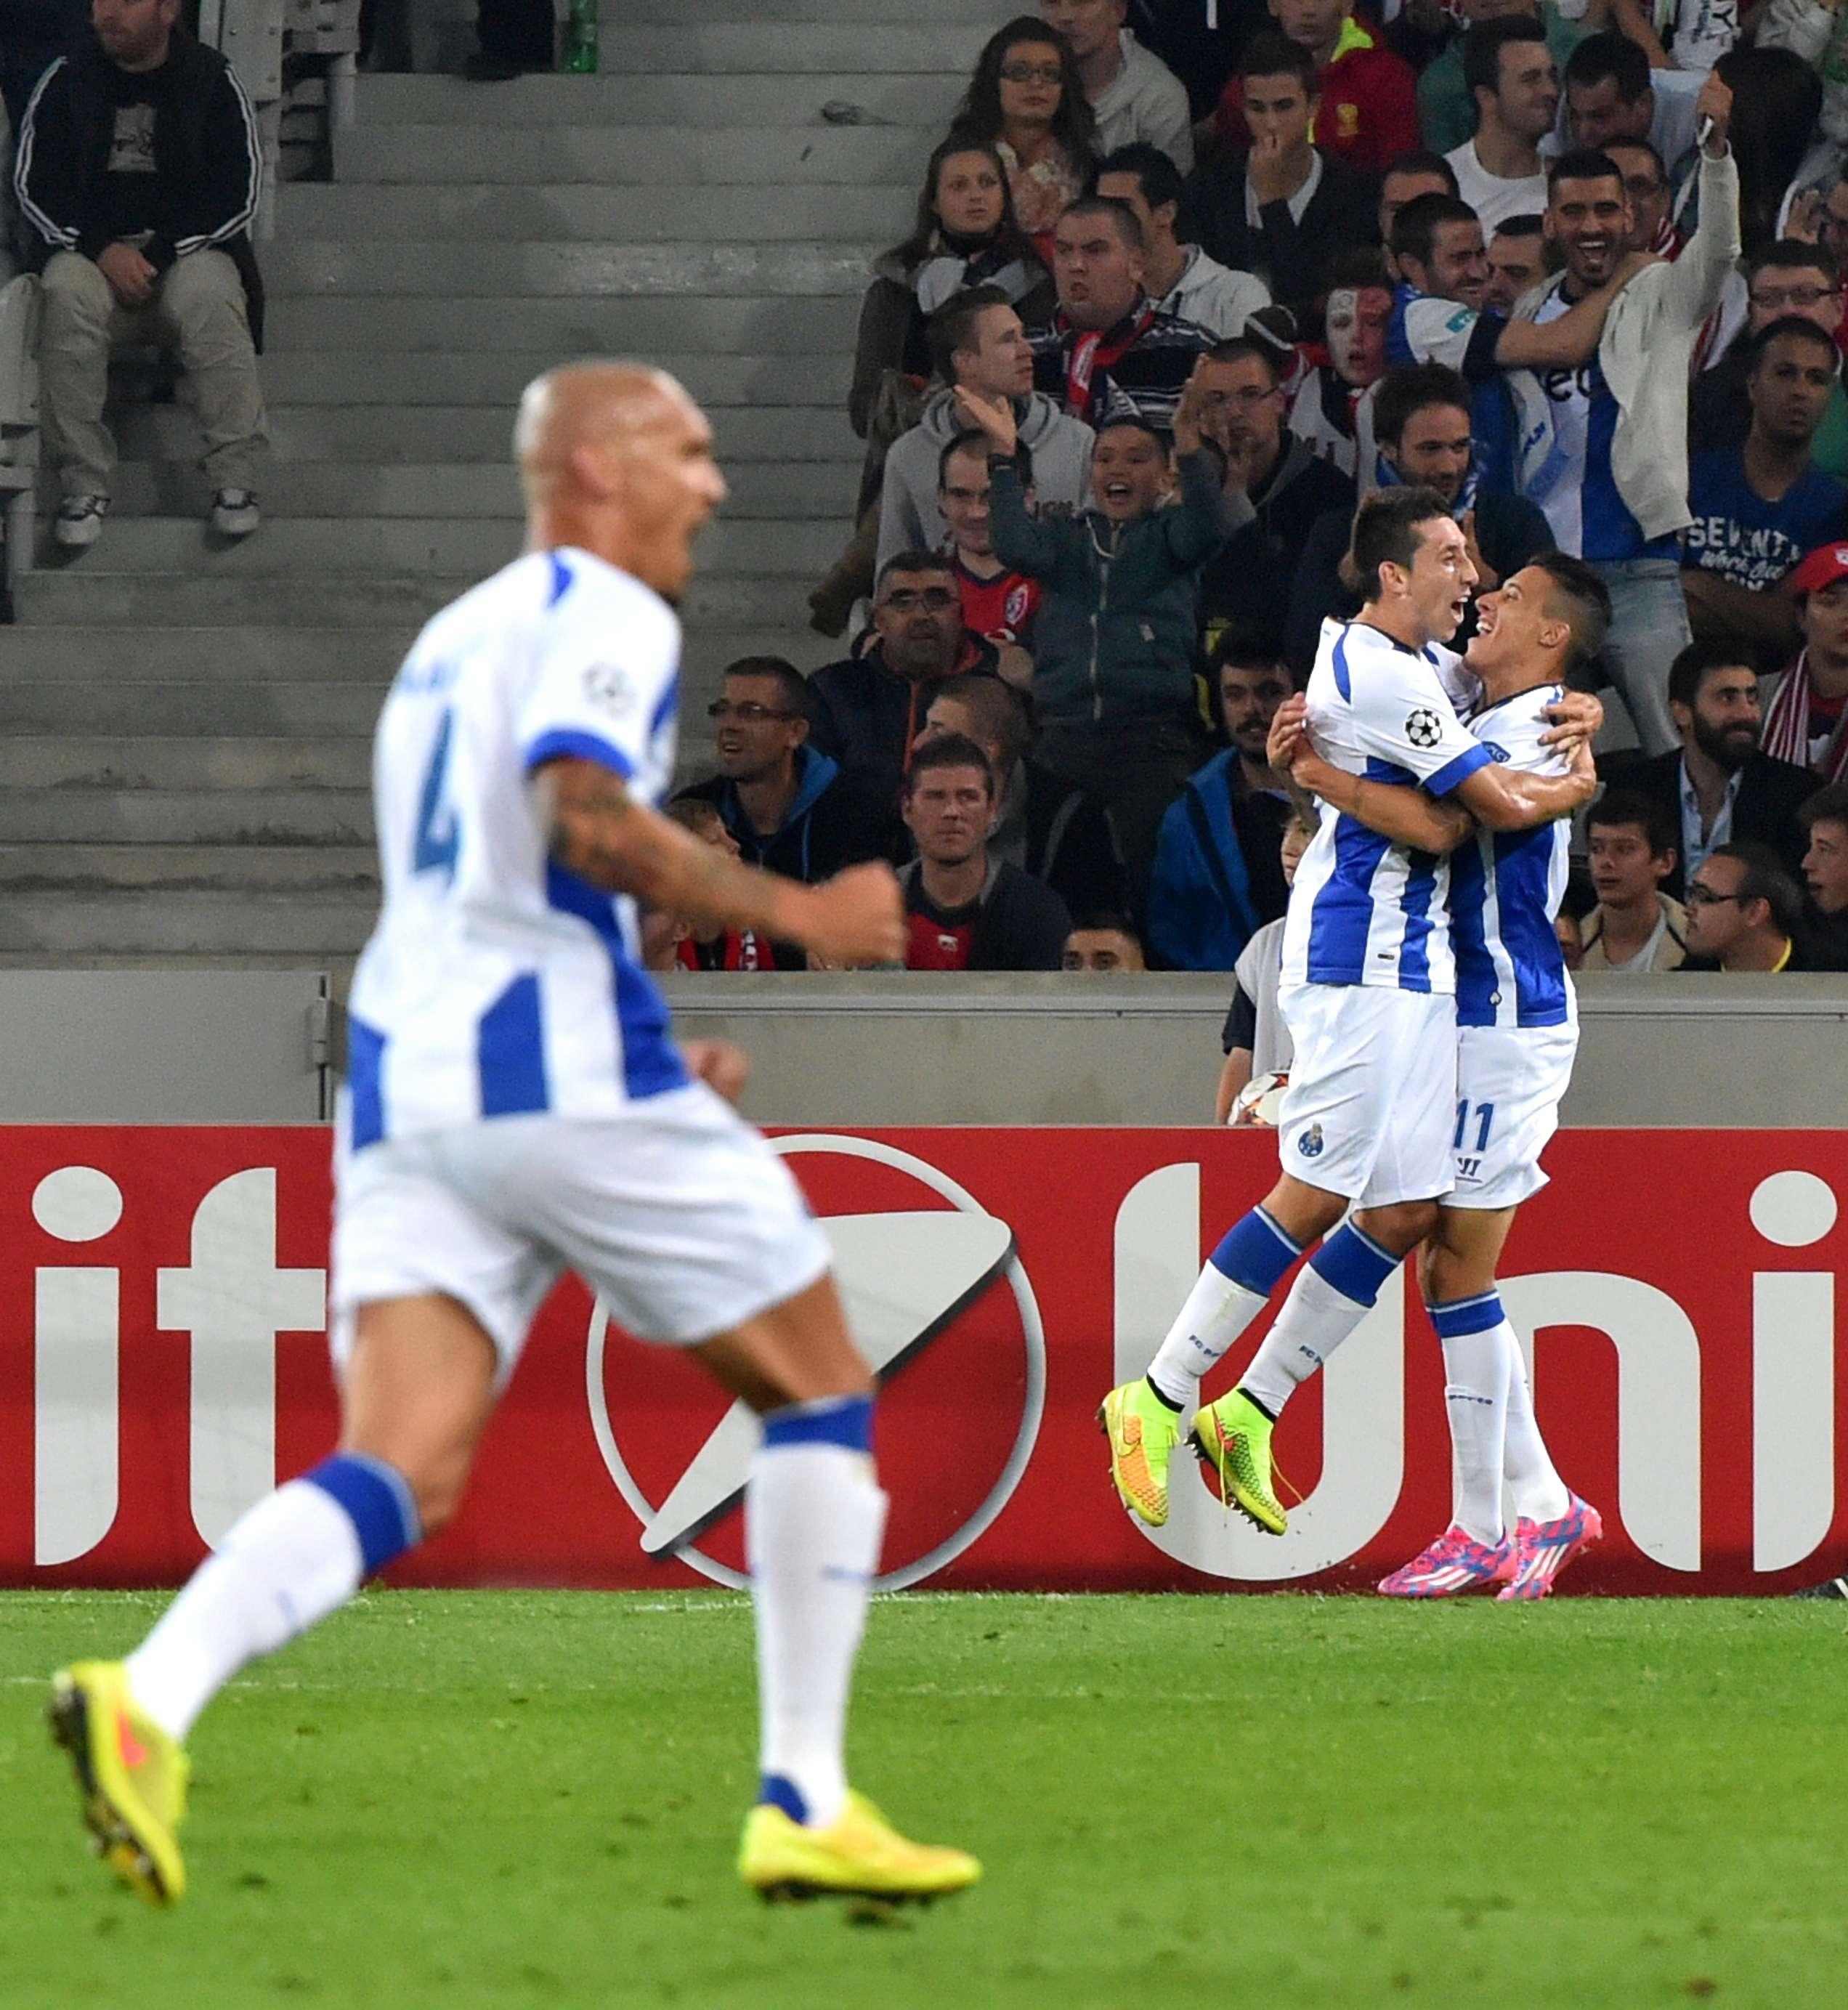 Champions: Porto supera Lille e define vaga em casa